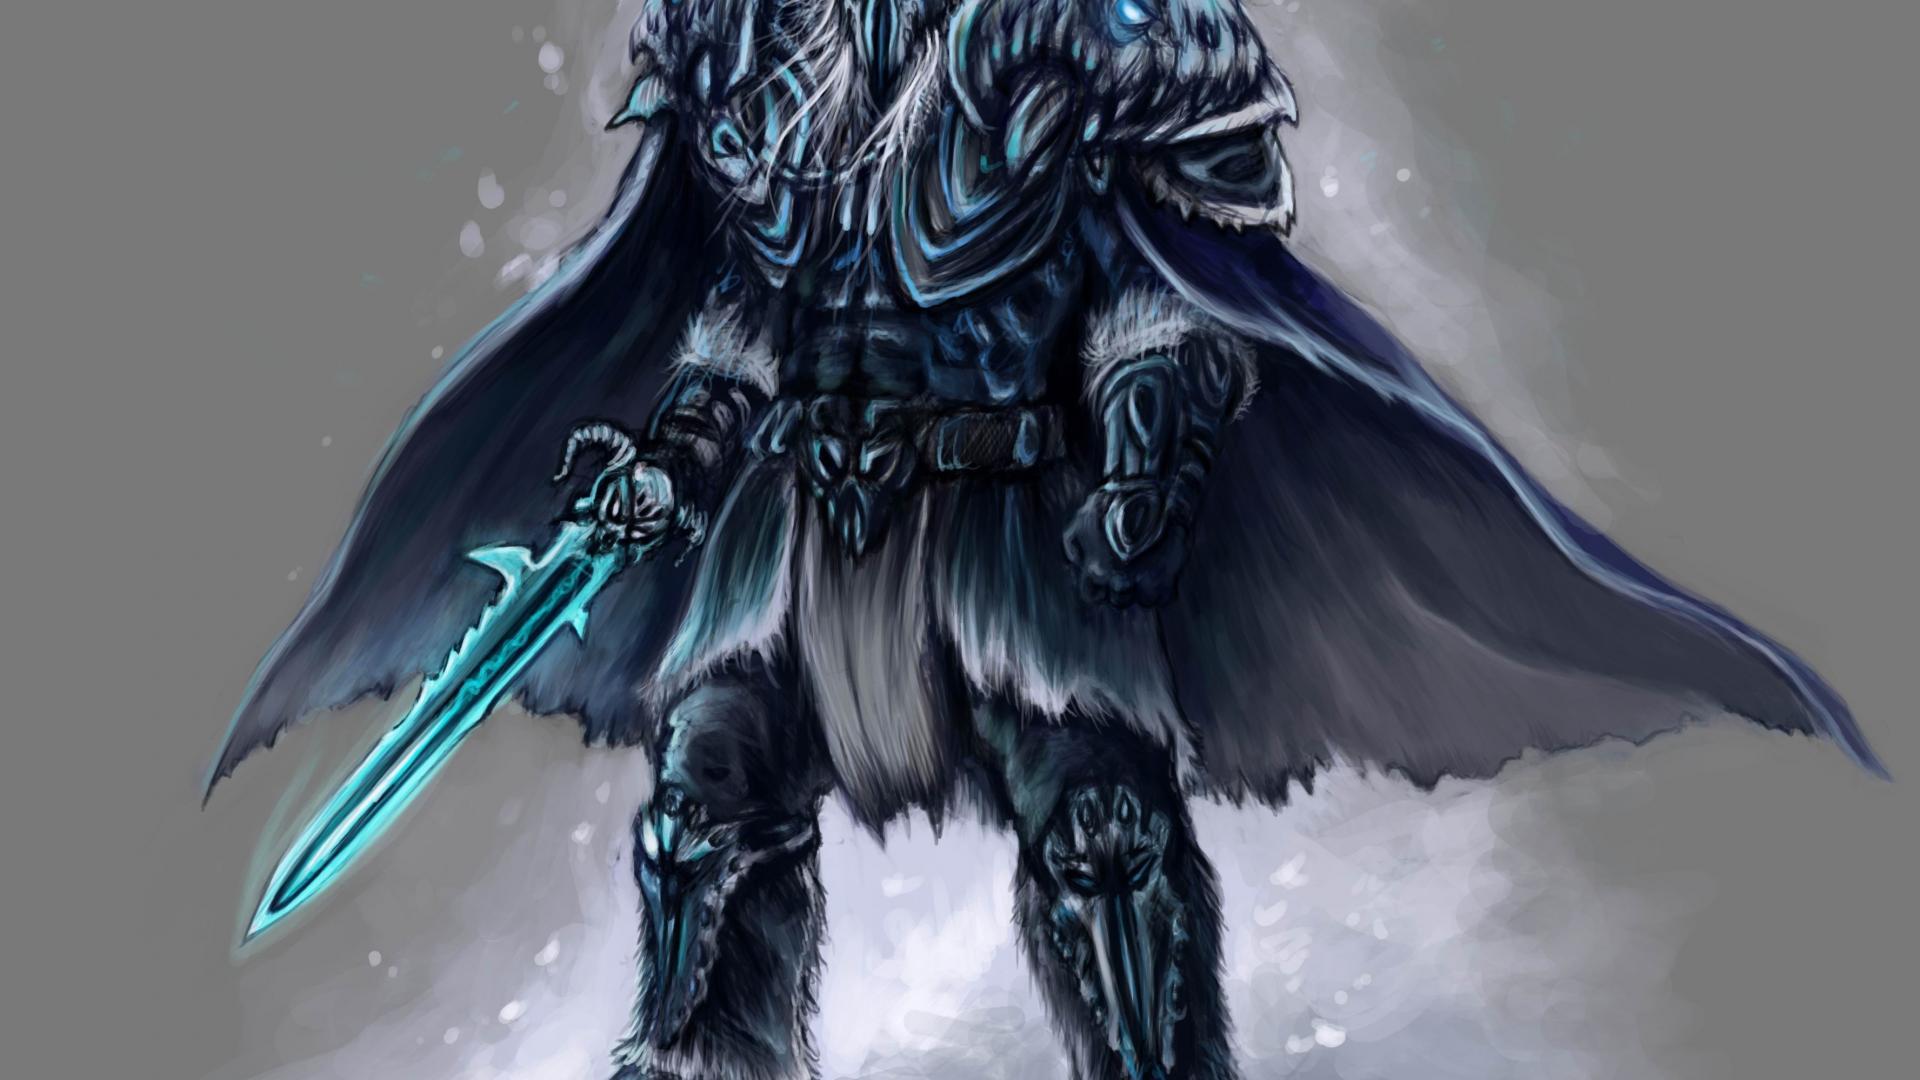 De World Of Warcraft Arthas 1920x1080 Wallpaper Teahub Io